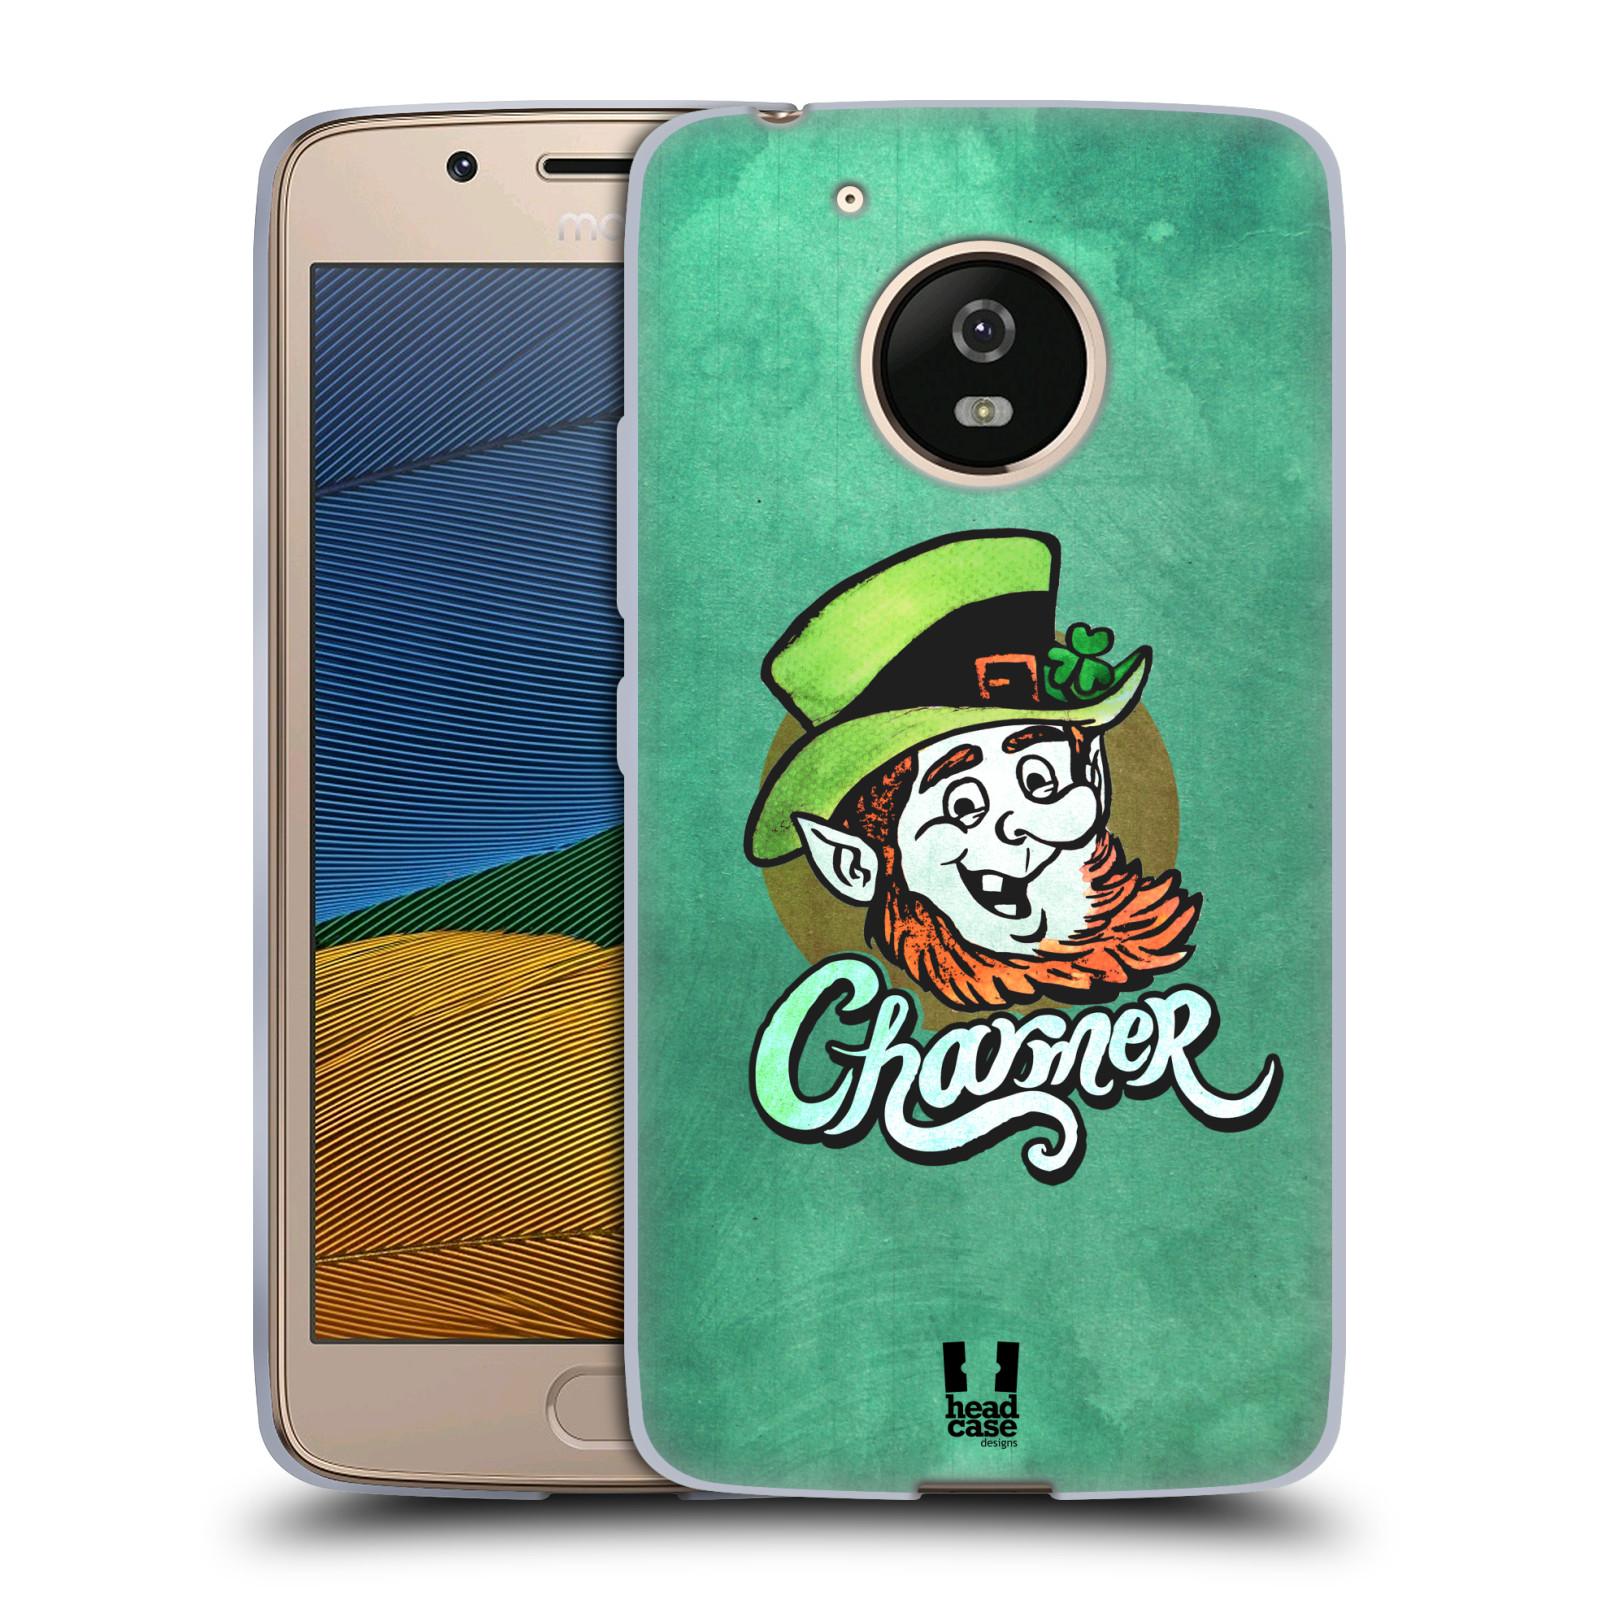 Silikonové pouzdro na mobil Lenovo Moto G5 - Head Case CHARMER (Silikonový kryt či obal na mobilní telefon Lenovo Moto G5)